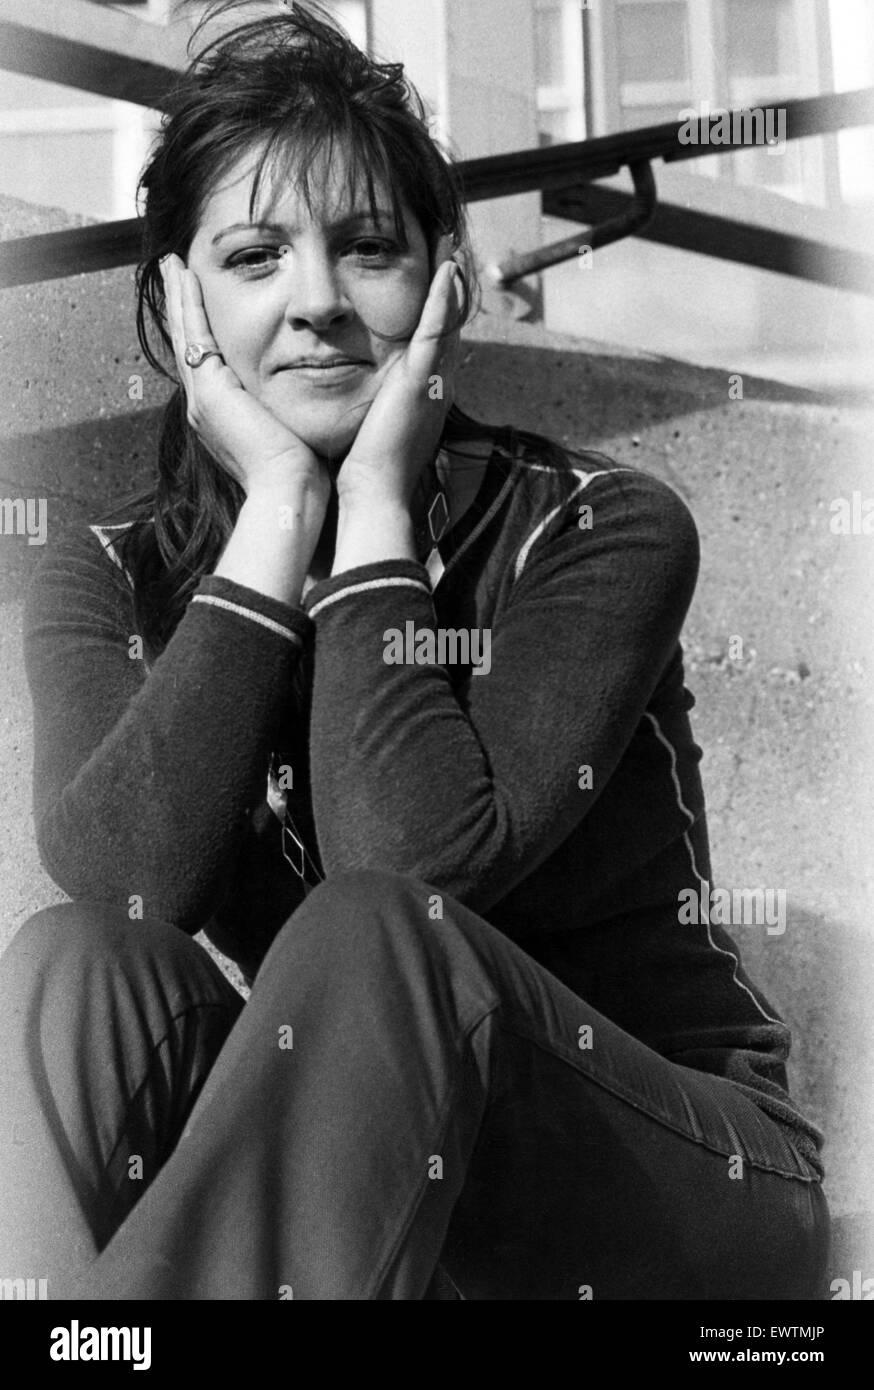 Actress Penelope Wilton. February 1974. - Stock Image